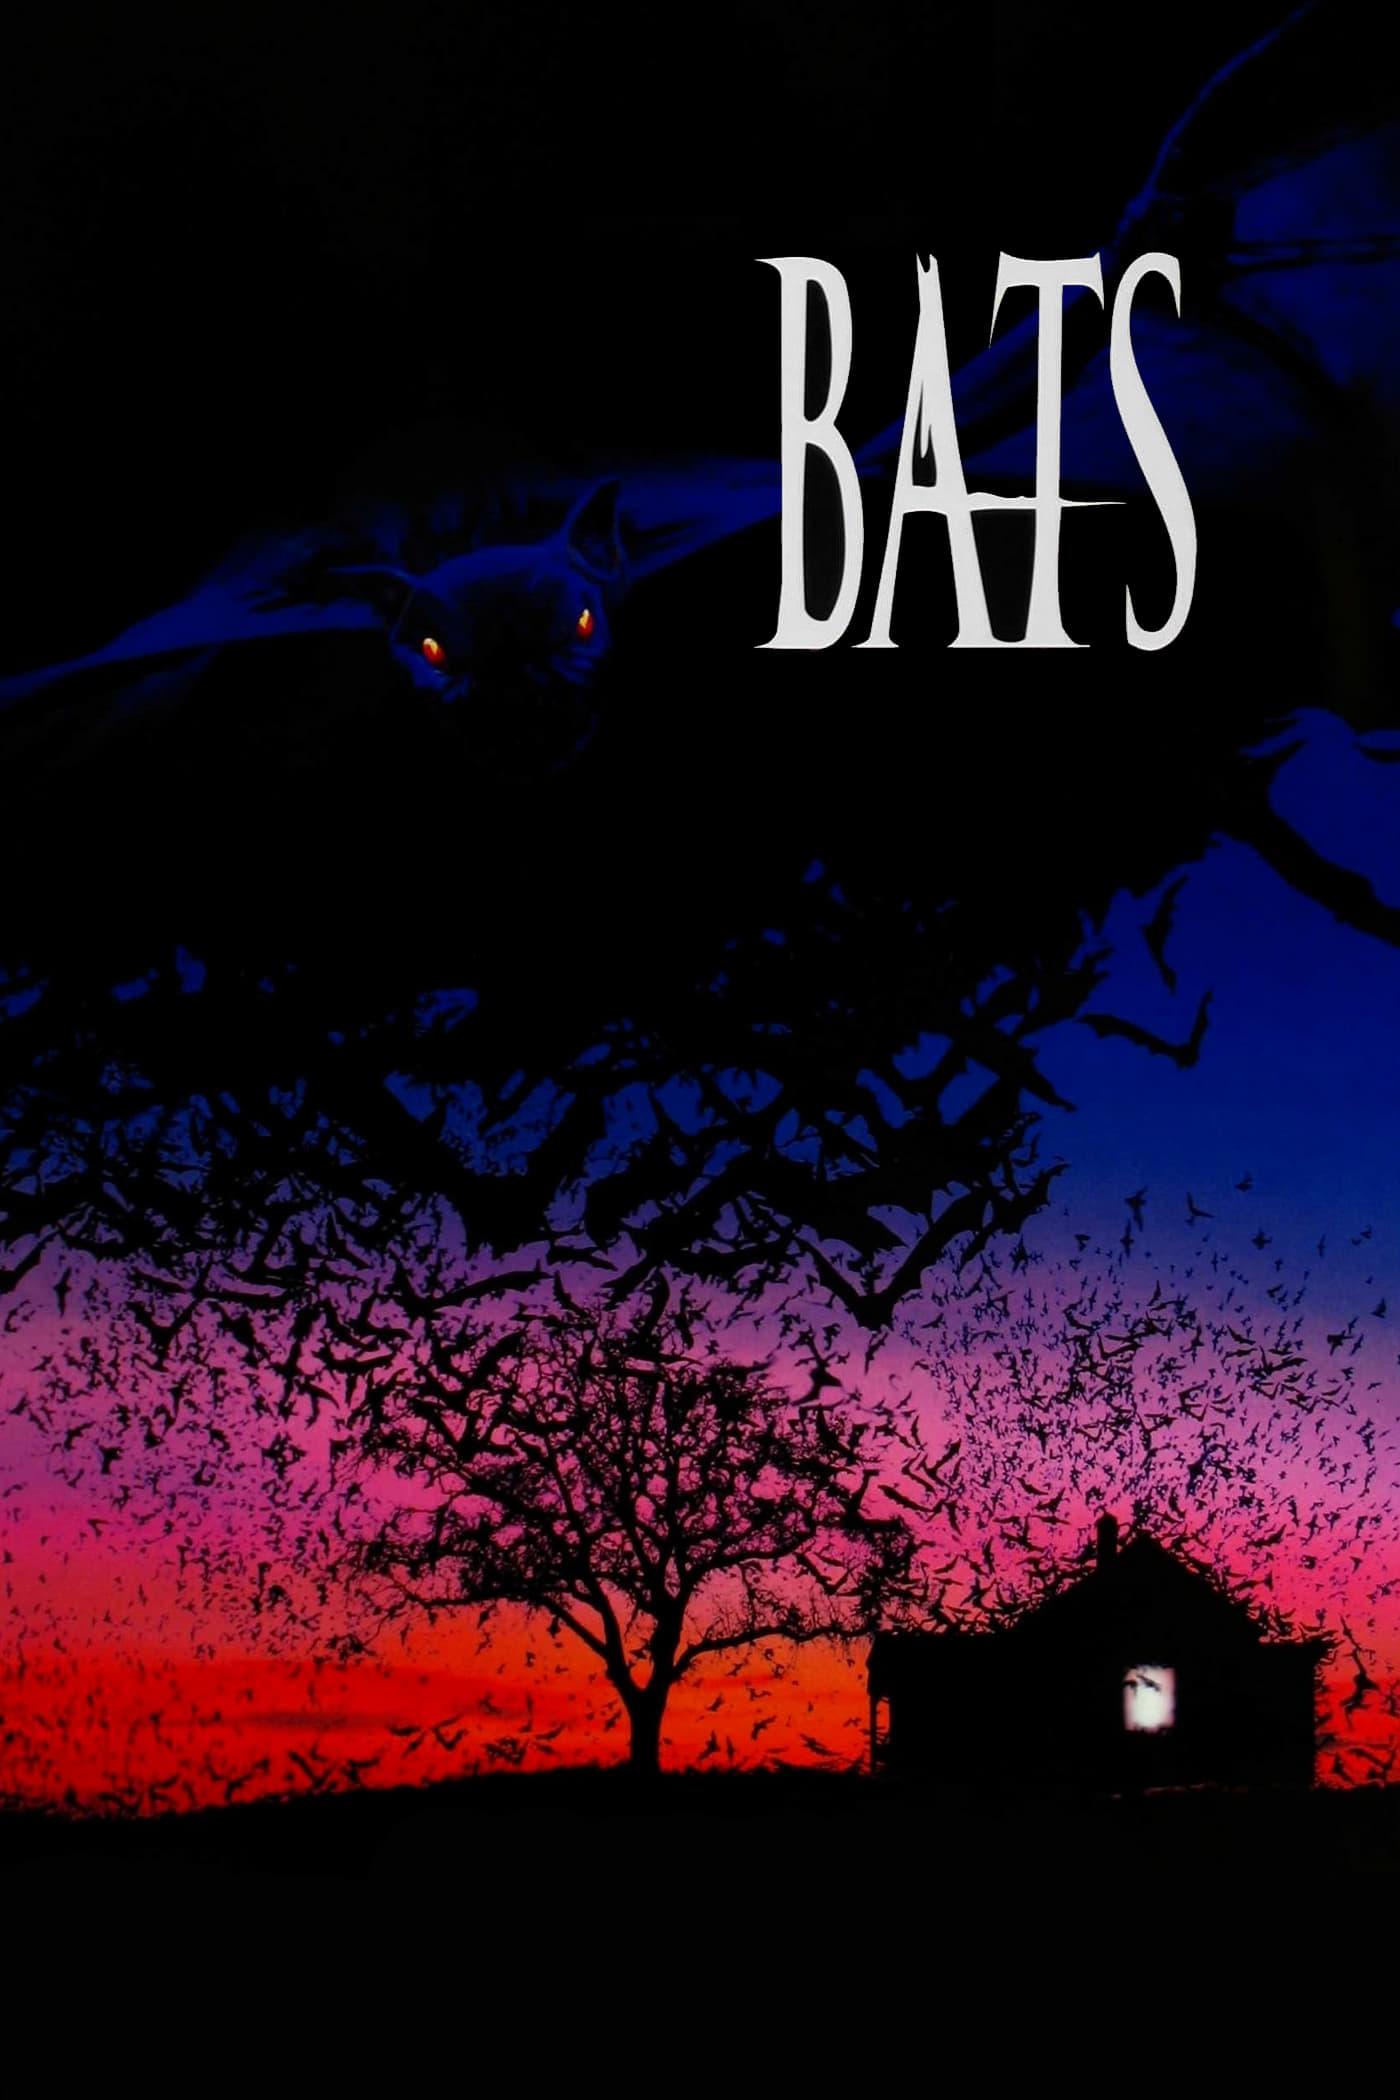 Bats (Murciélagos)